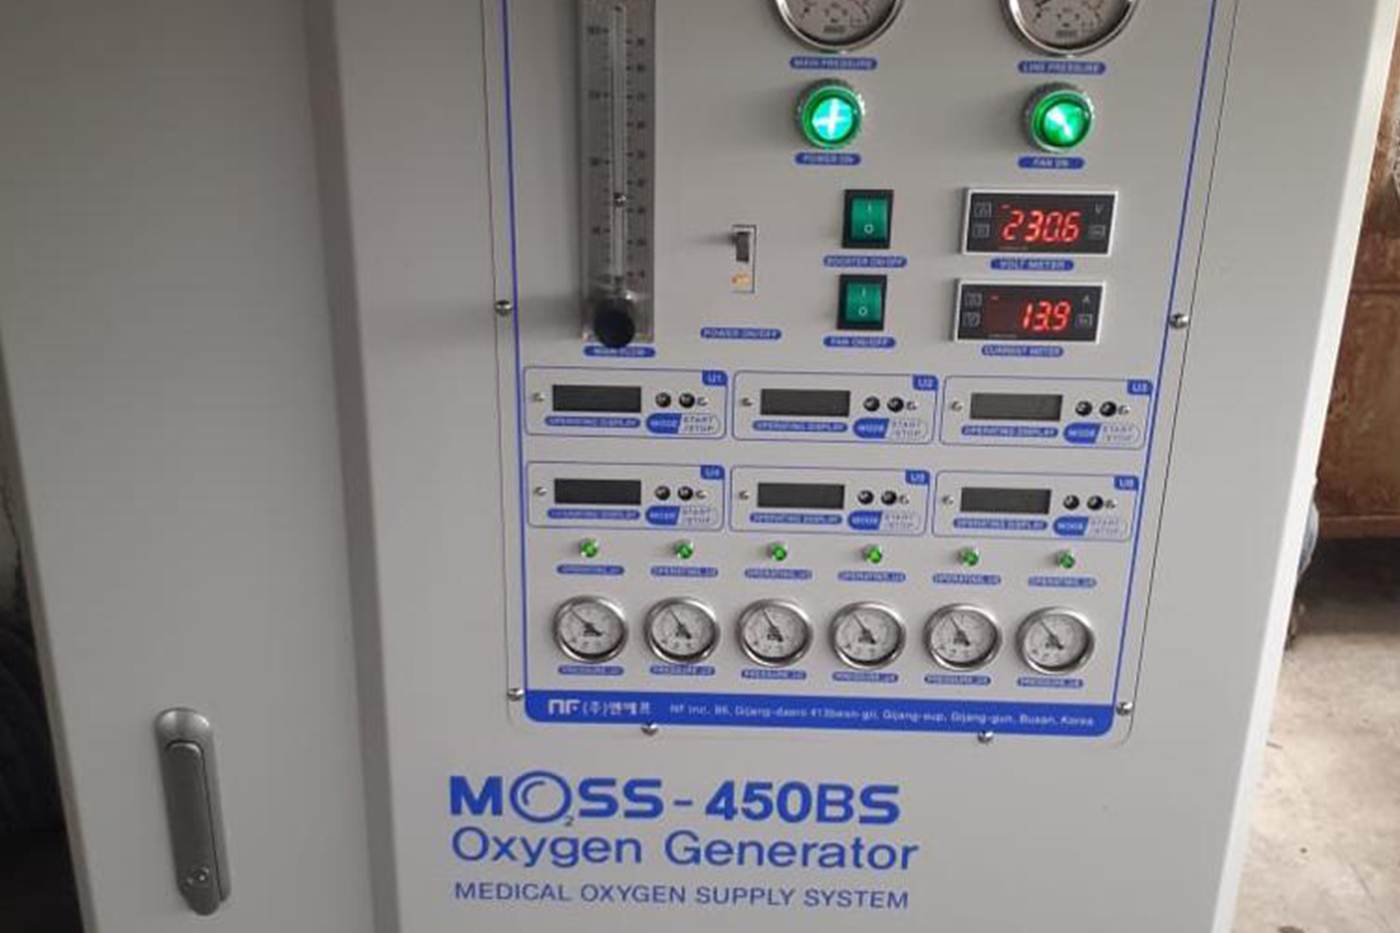 Oxygen Generator Plant installed by Lotus Herbals in New Delhi